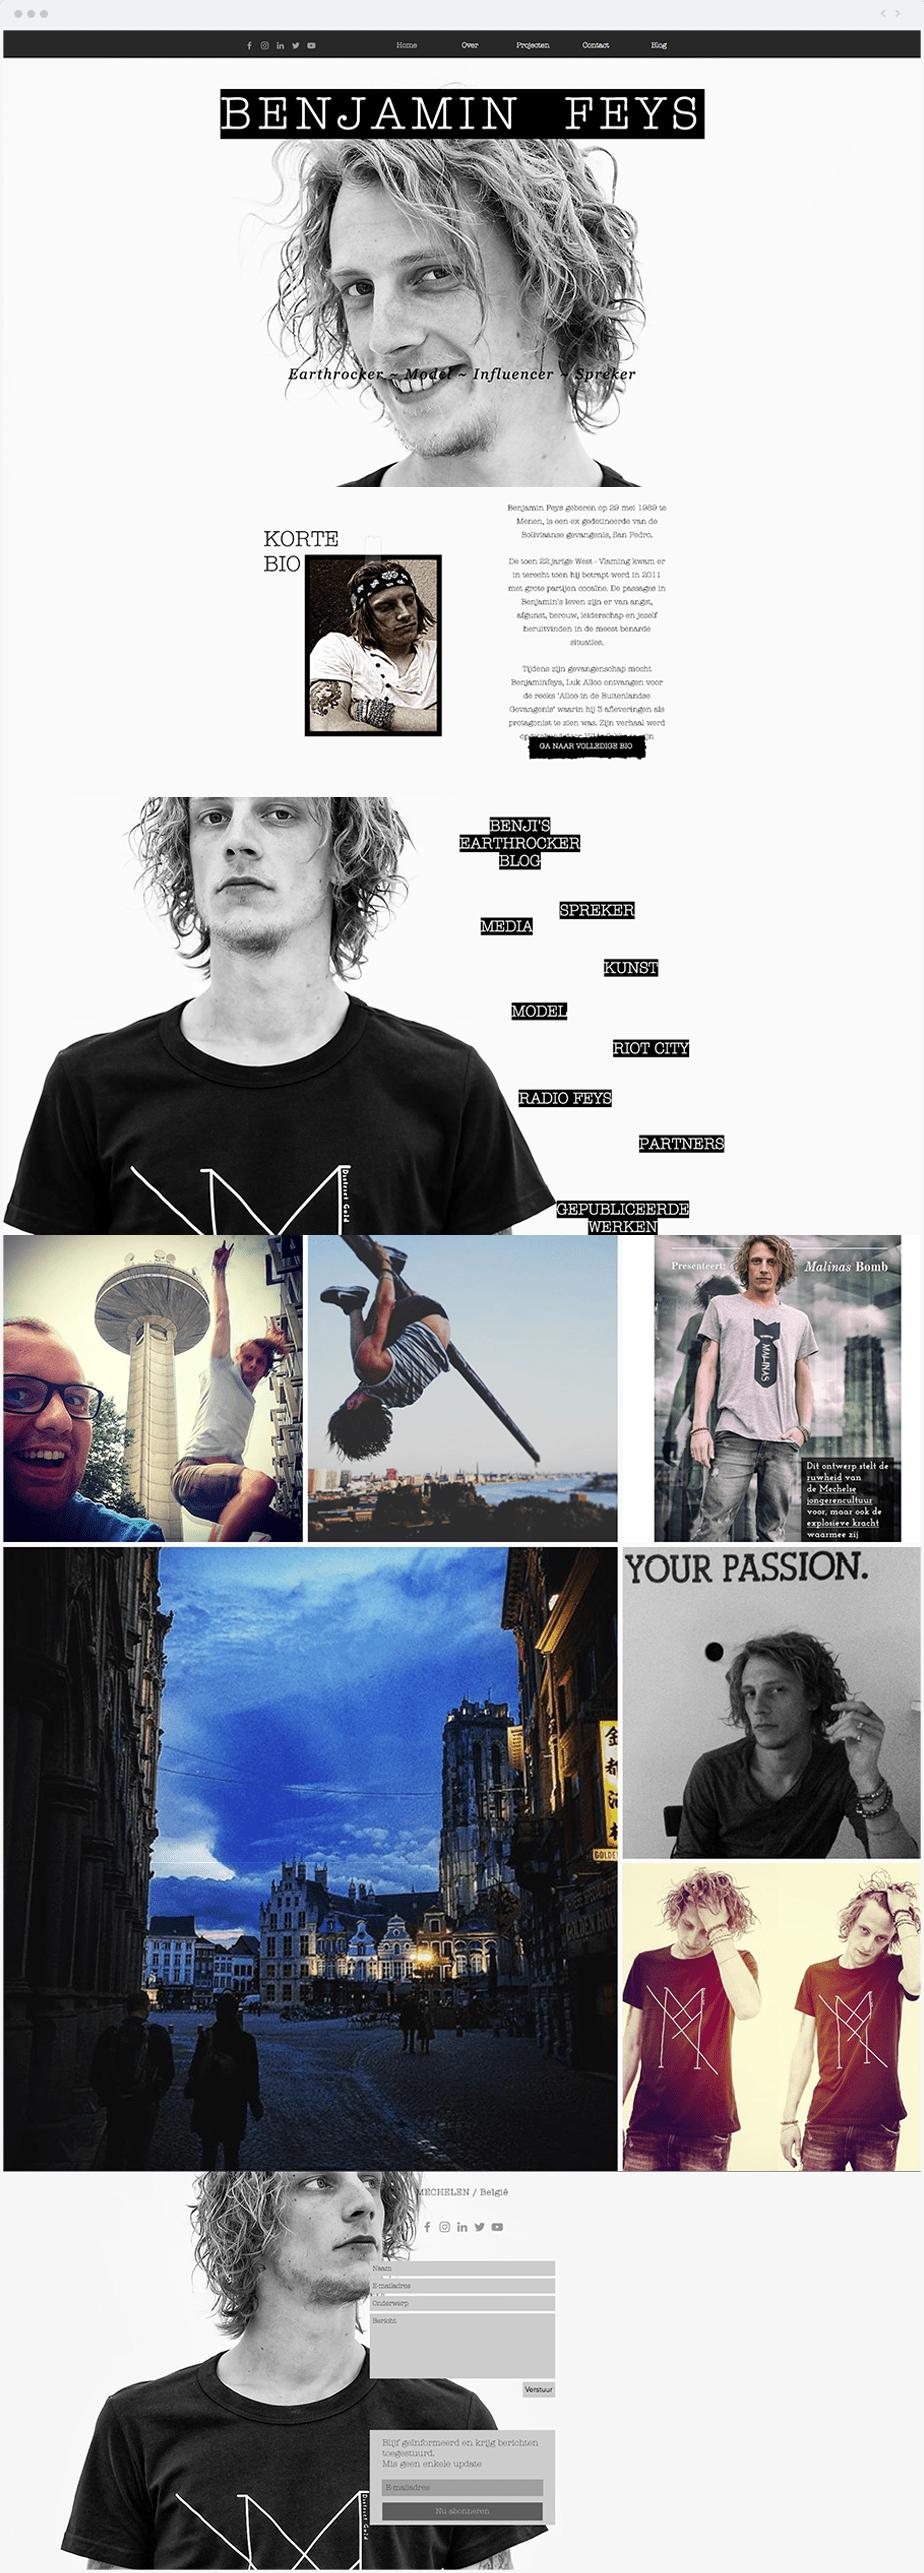 Wix Website - Modeling Portfolio of Benjamin Feys